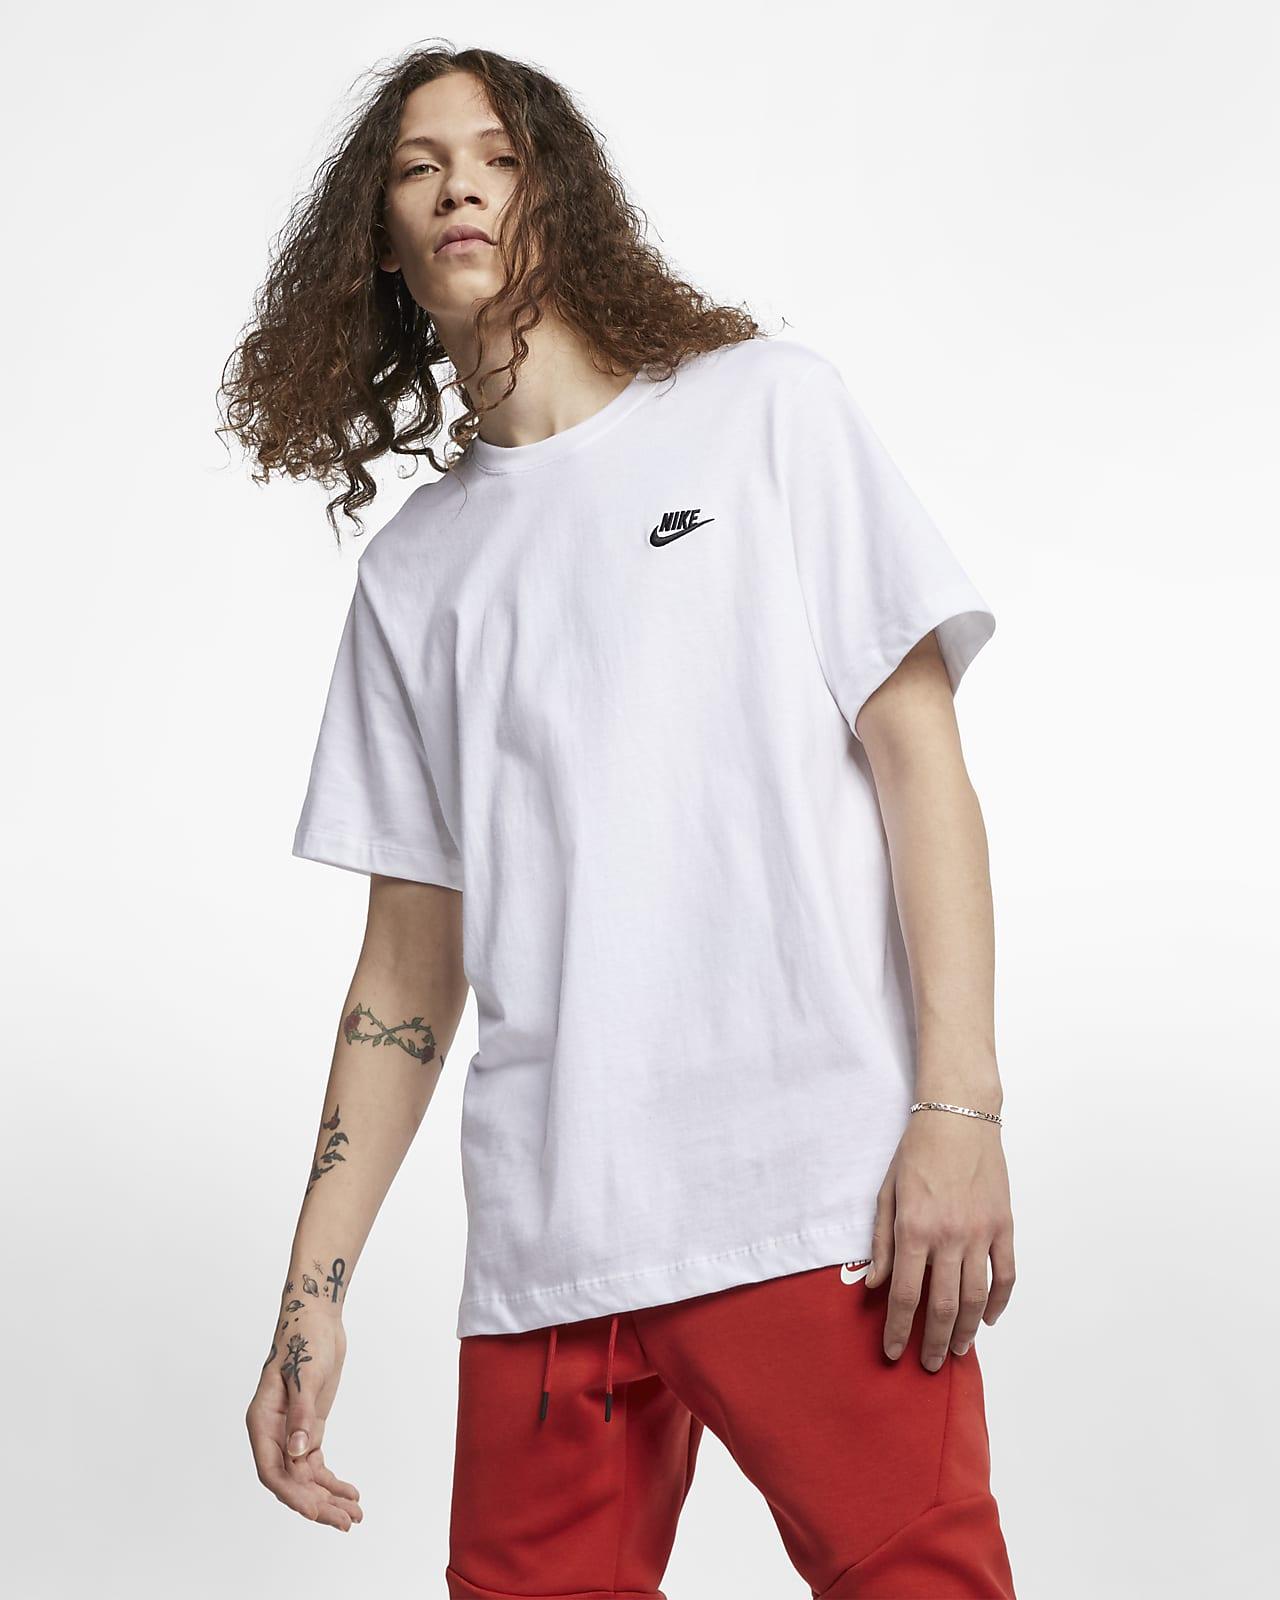 lanzar En el nombre Guión  Nike Sportswear Club Men's T-Shirt. Nike LU